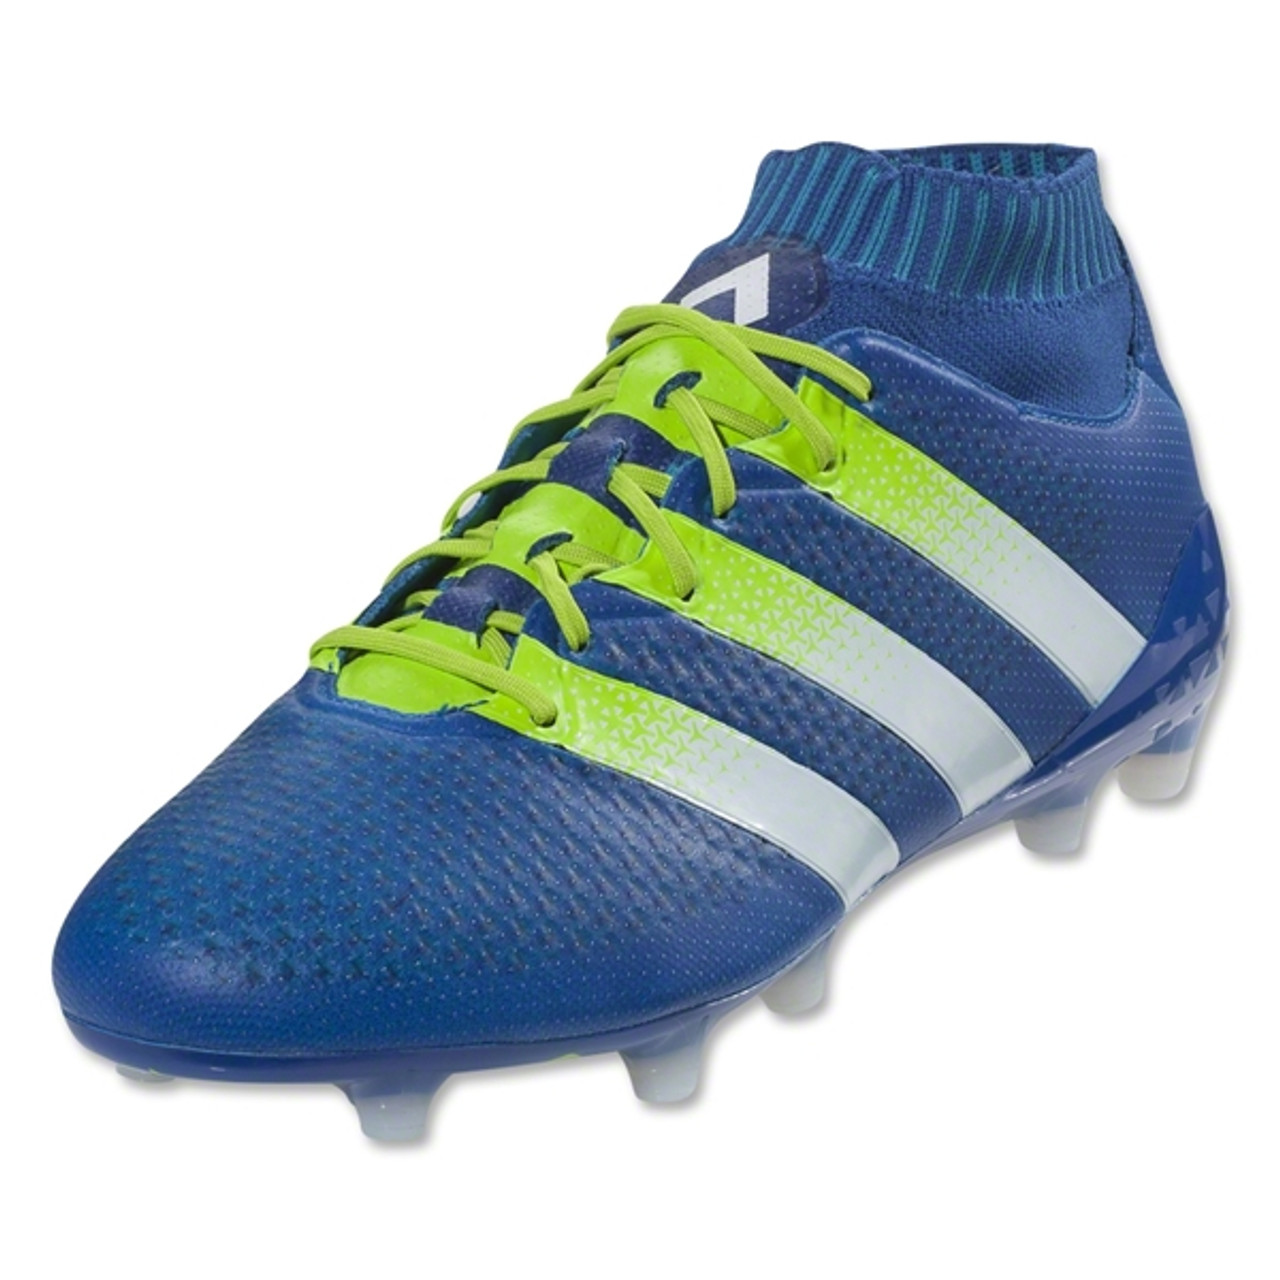 95af7a157 Adidas Ace 16.1 Primeknit FG - Blue - Soccer City